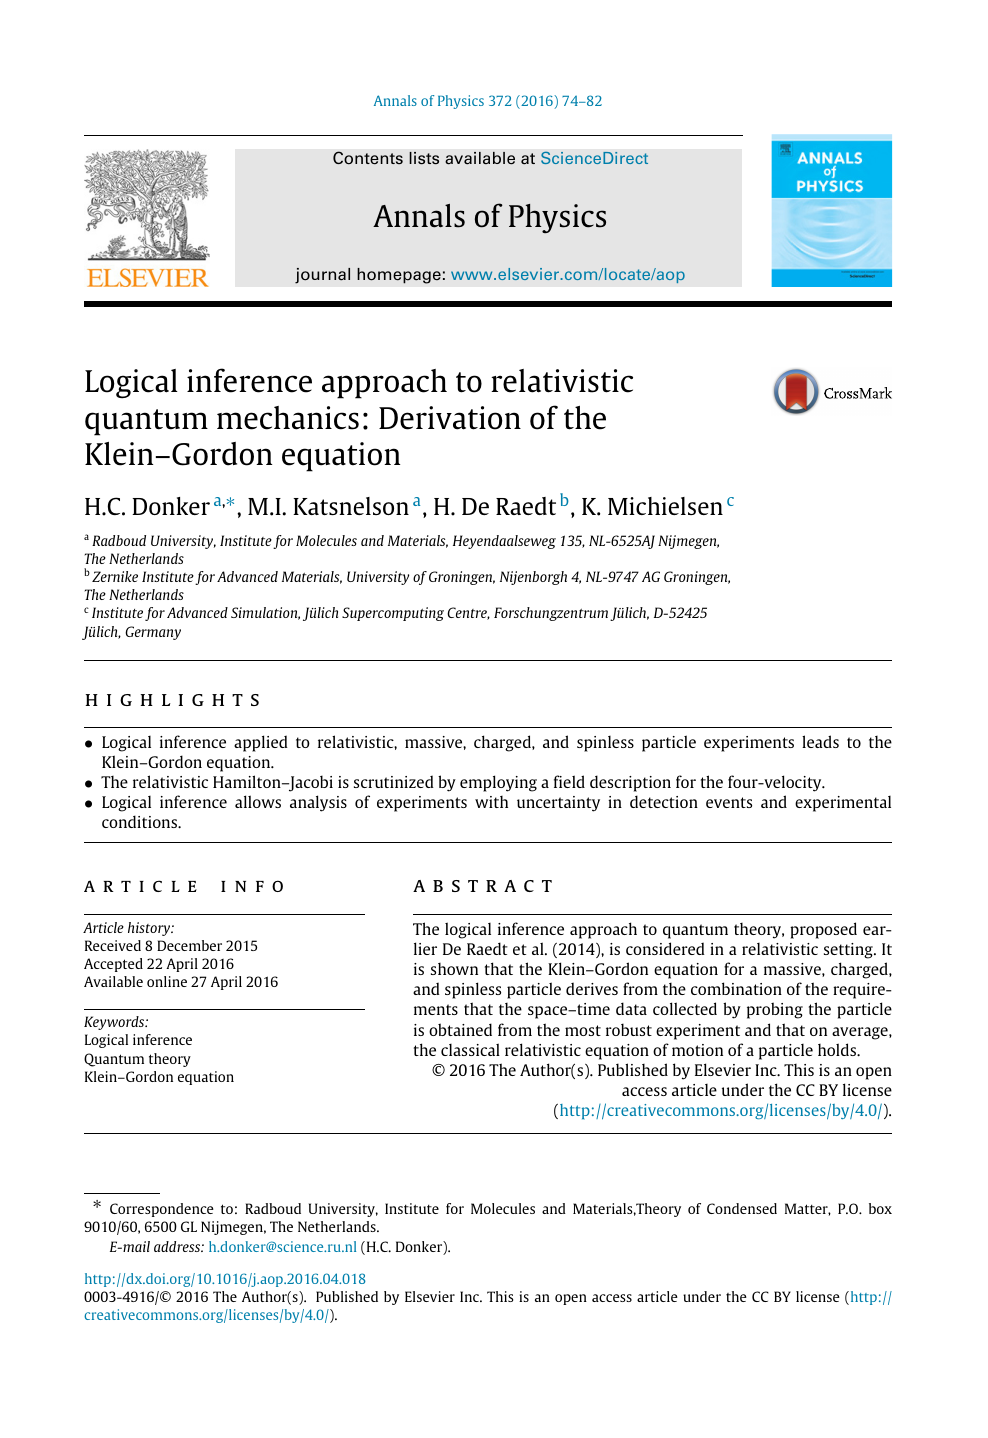 Logical inference approach to relativistic quantum mechanics